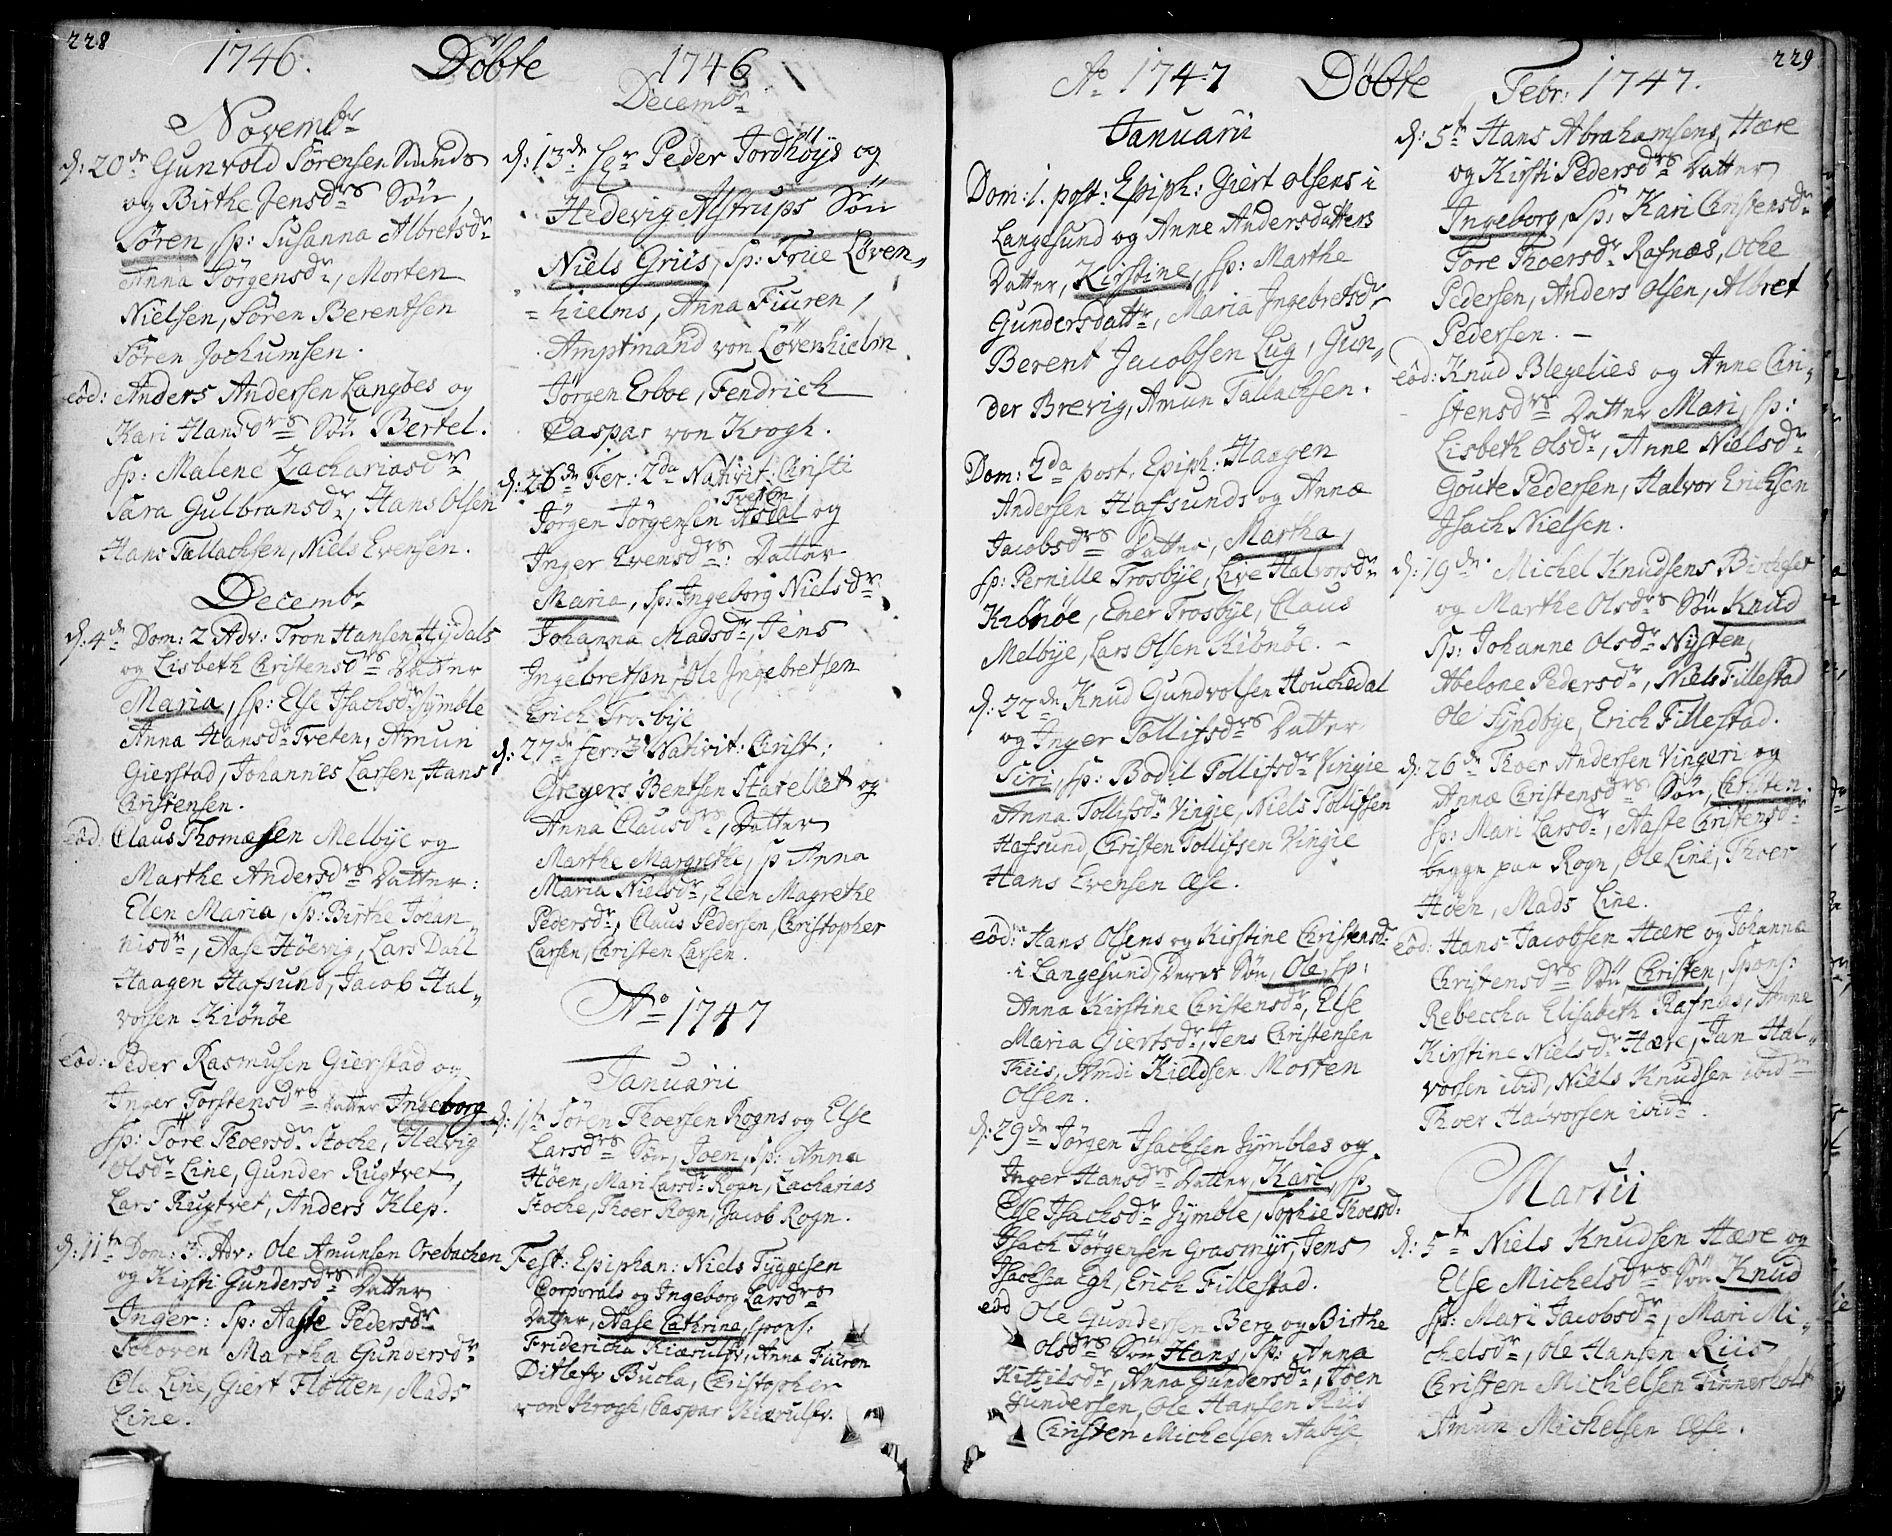 SAKO, Bamble kirkebøker, F/Fa/L0001: Ministerialbok nr. I 1, 1702-1774, s. 228-229